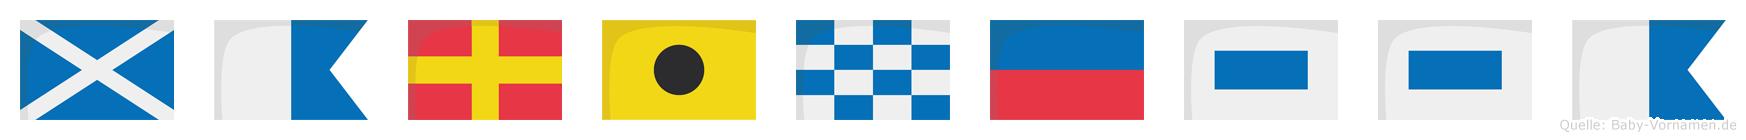 Marinessa im Flaggenalphabet